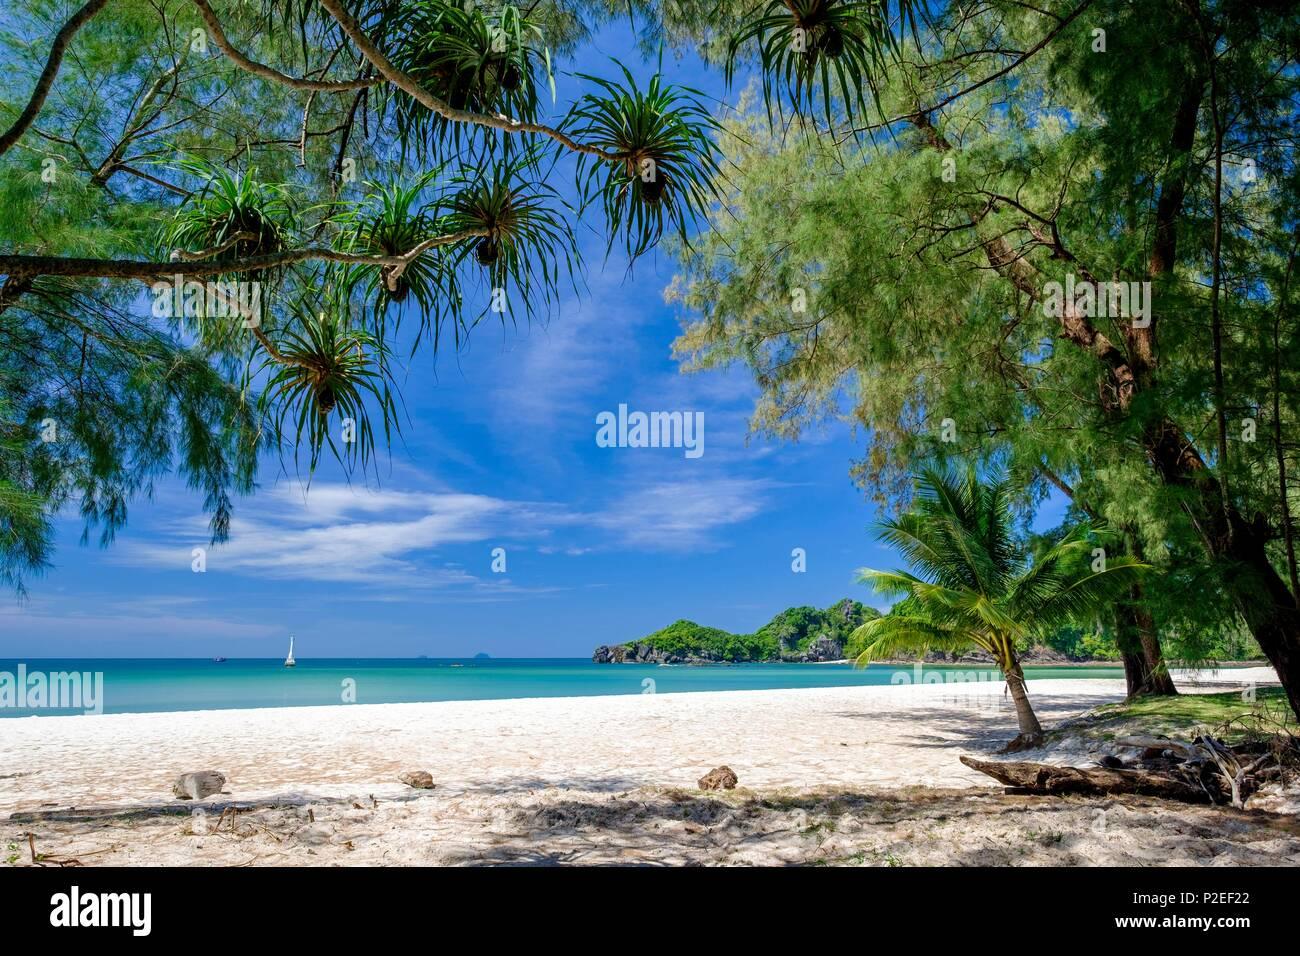 Thailand, Satun province, Tarutao National Marine Park, Ko Tarutao island, Ao Pante Malacca beach - Stock Image